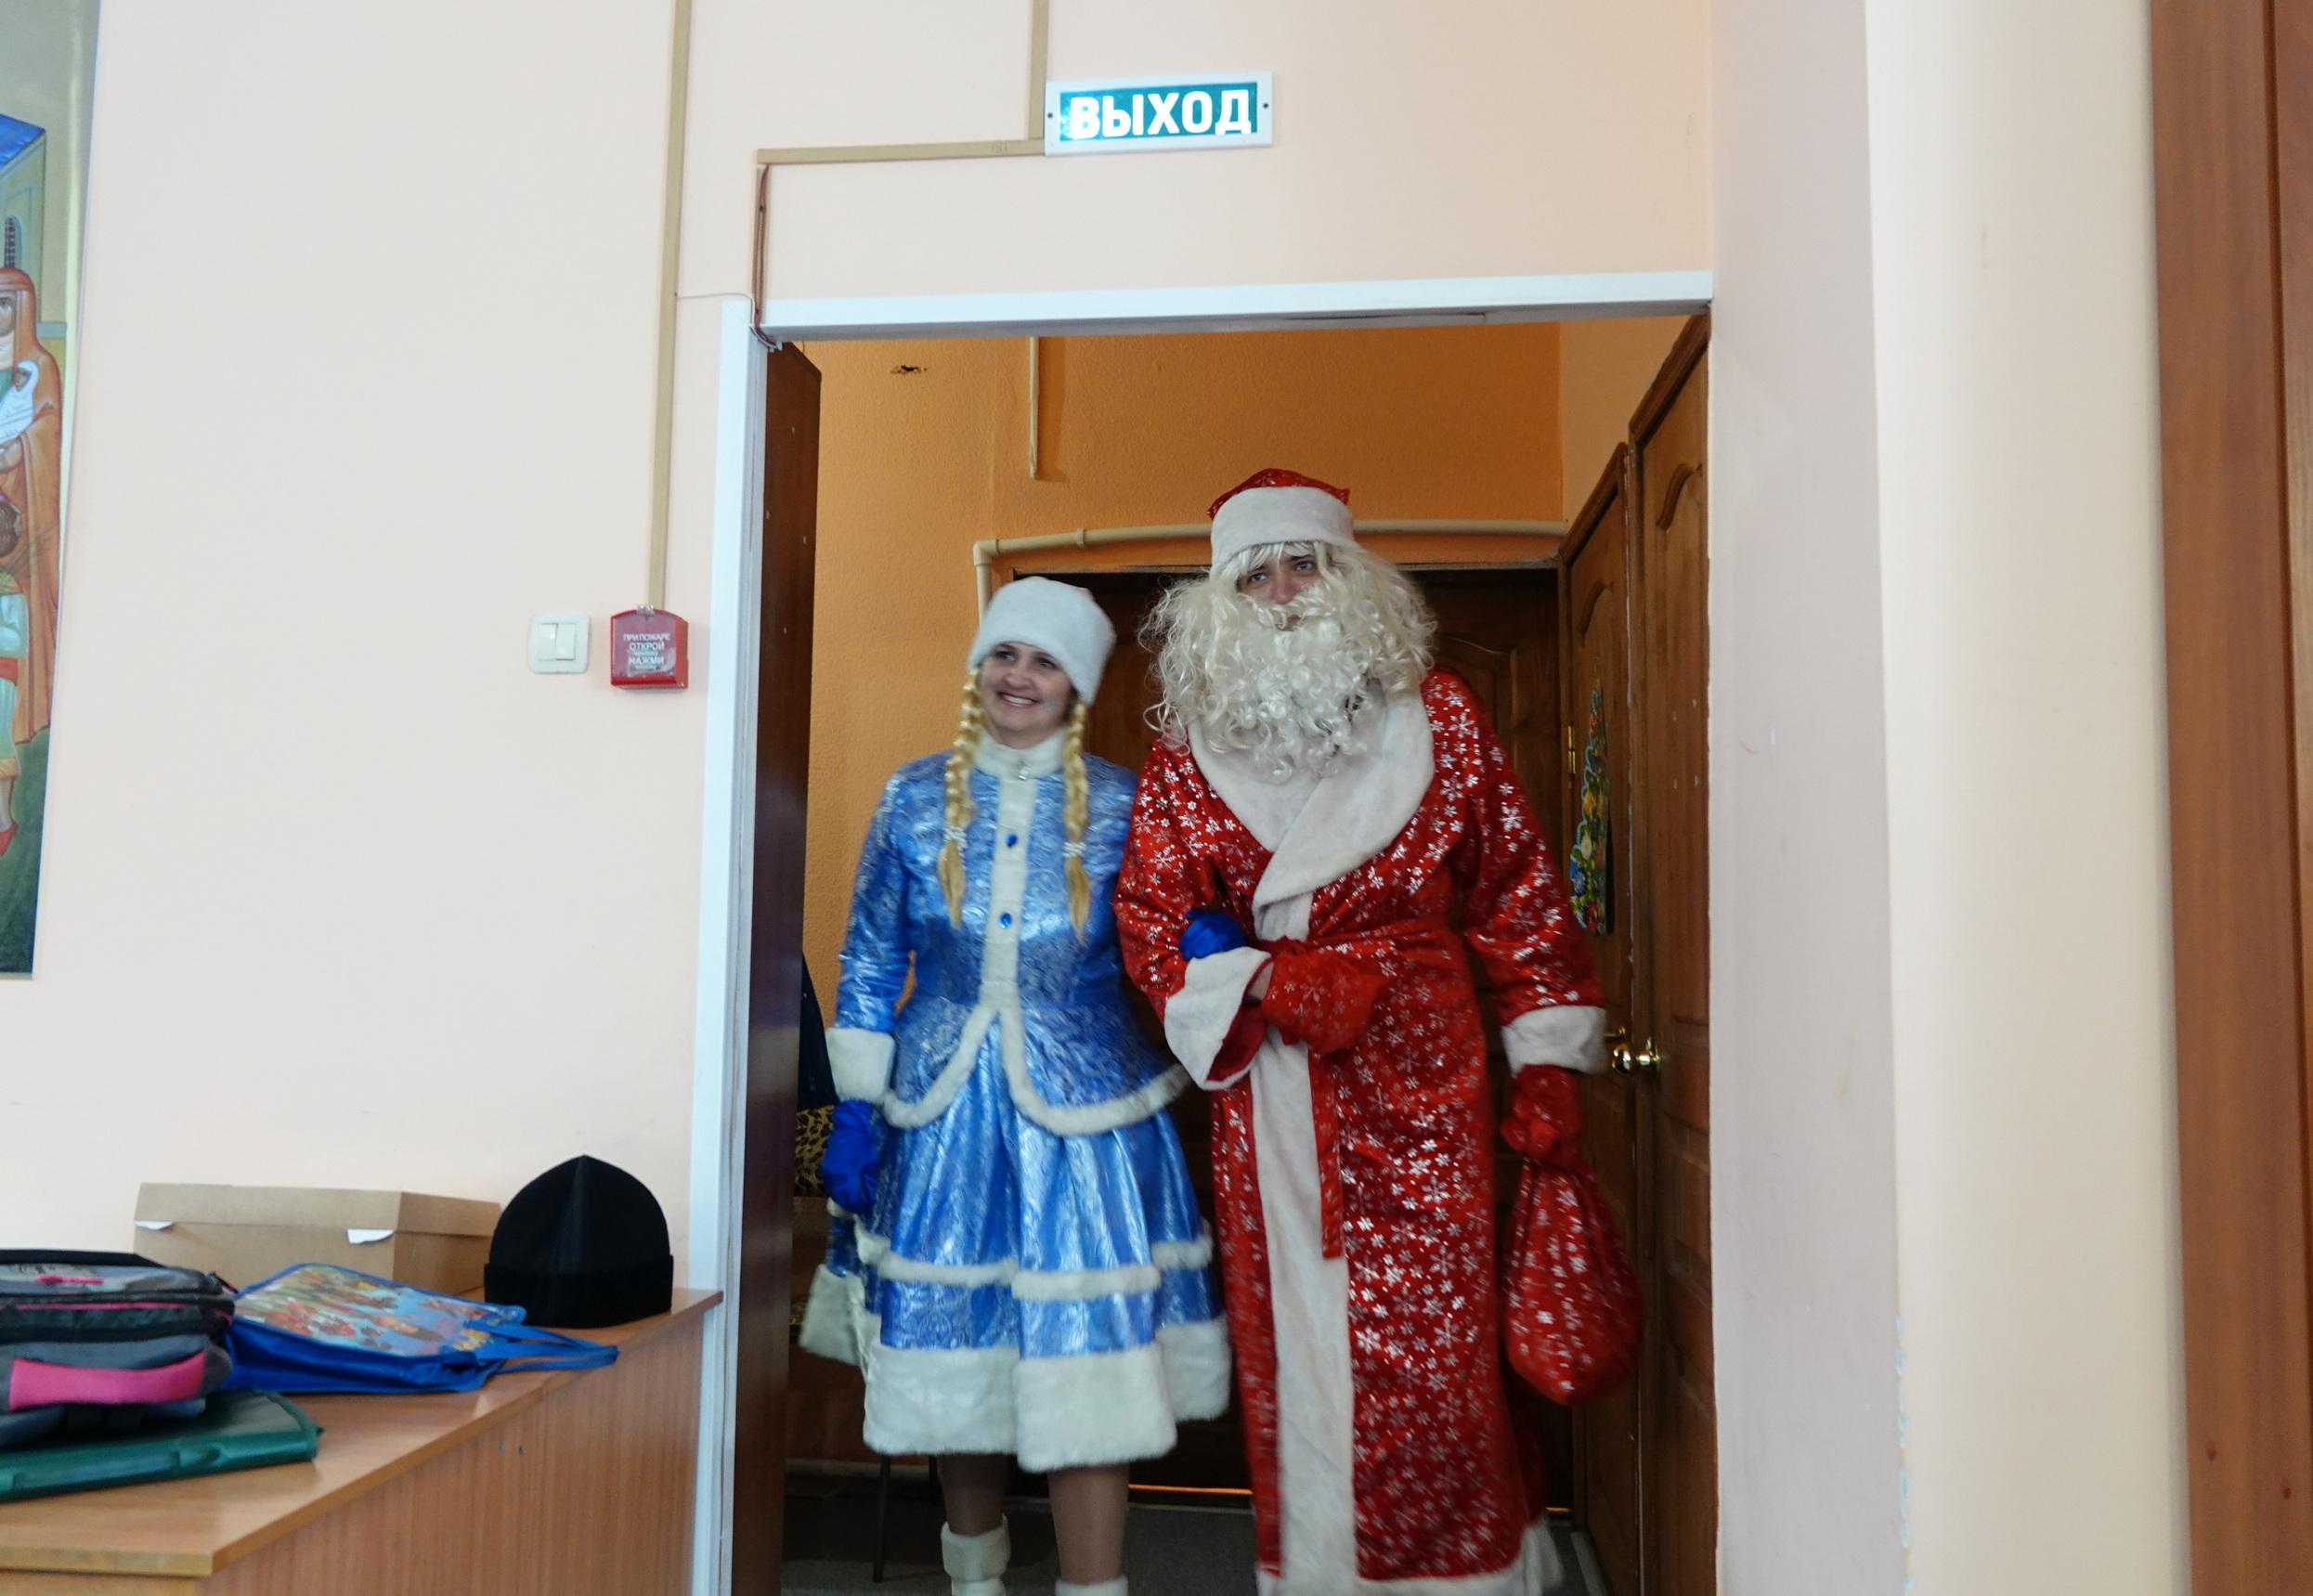 http://monuspen.ru/photoreports/c79af77f811e227264239bc8cfb51fbe.JPG